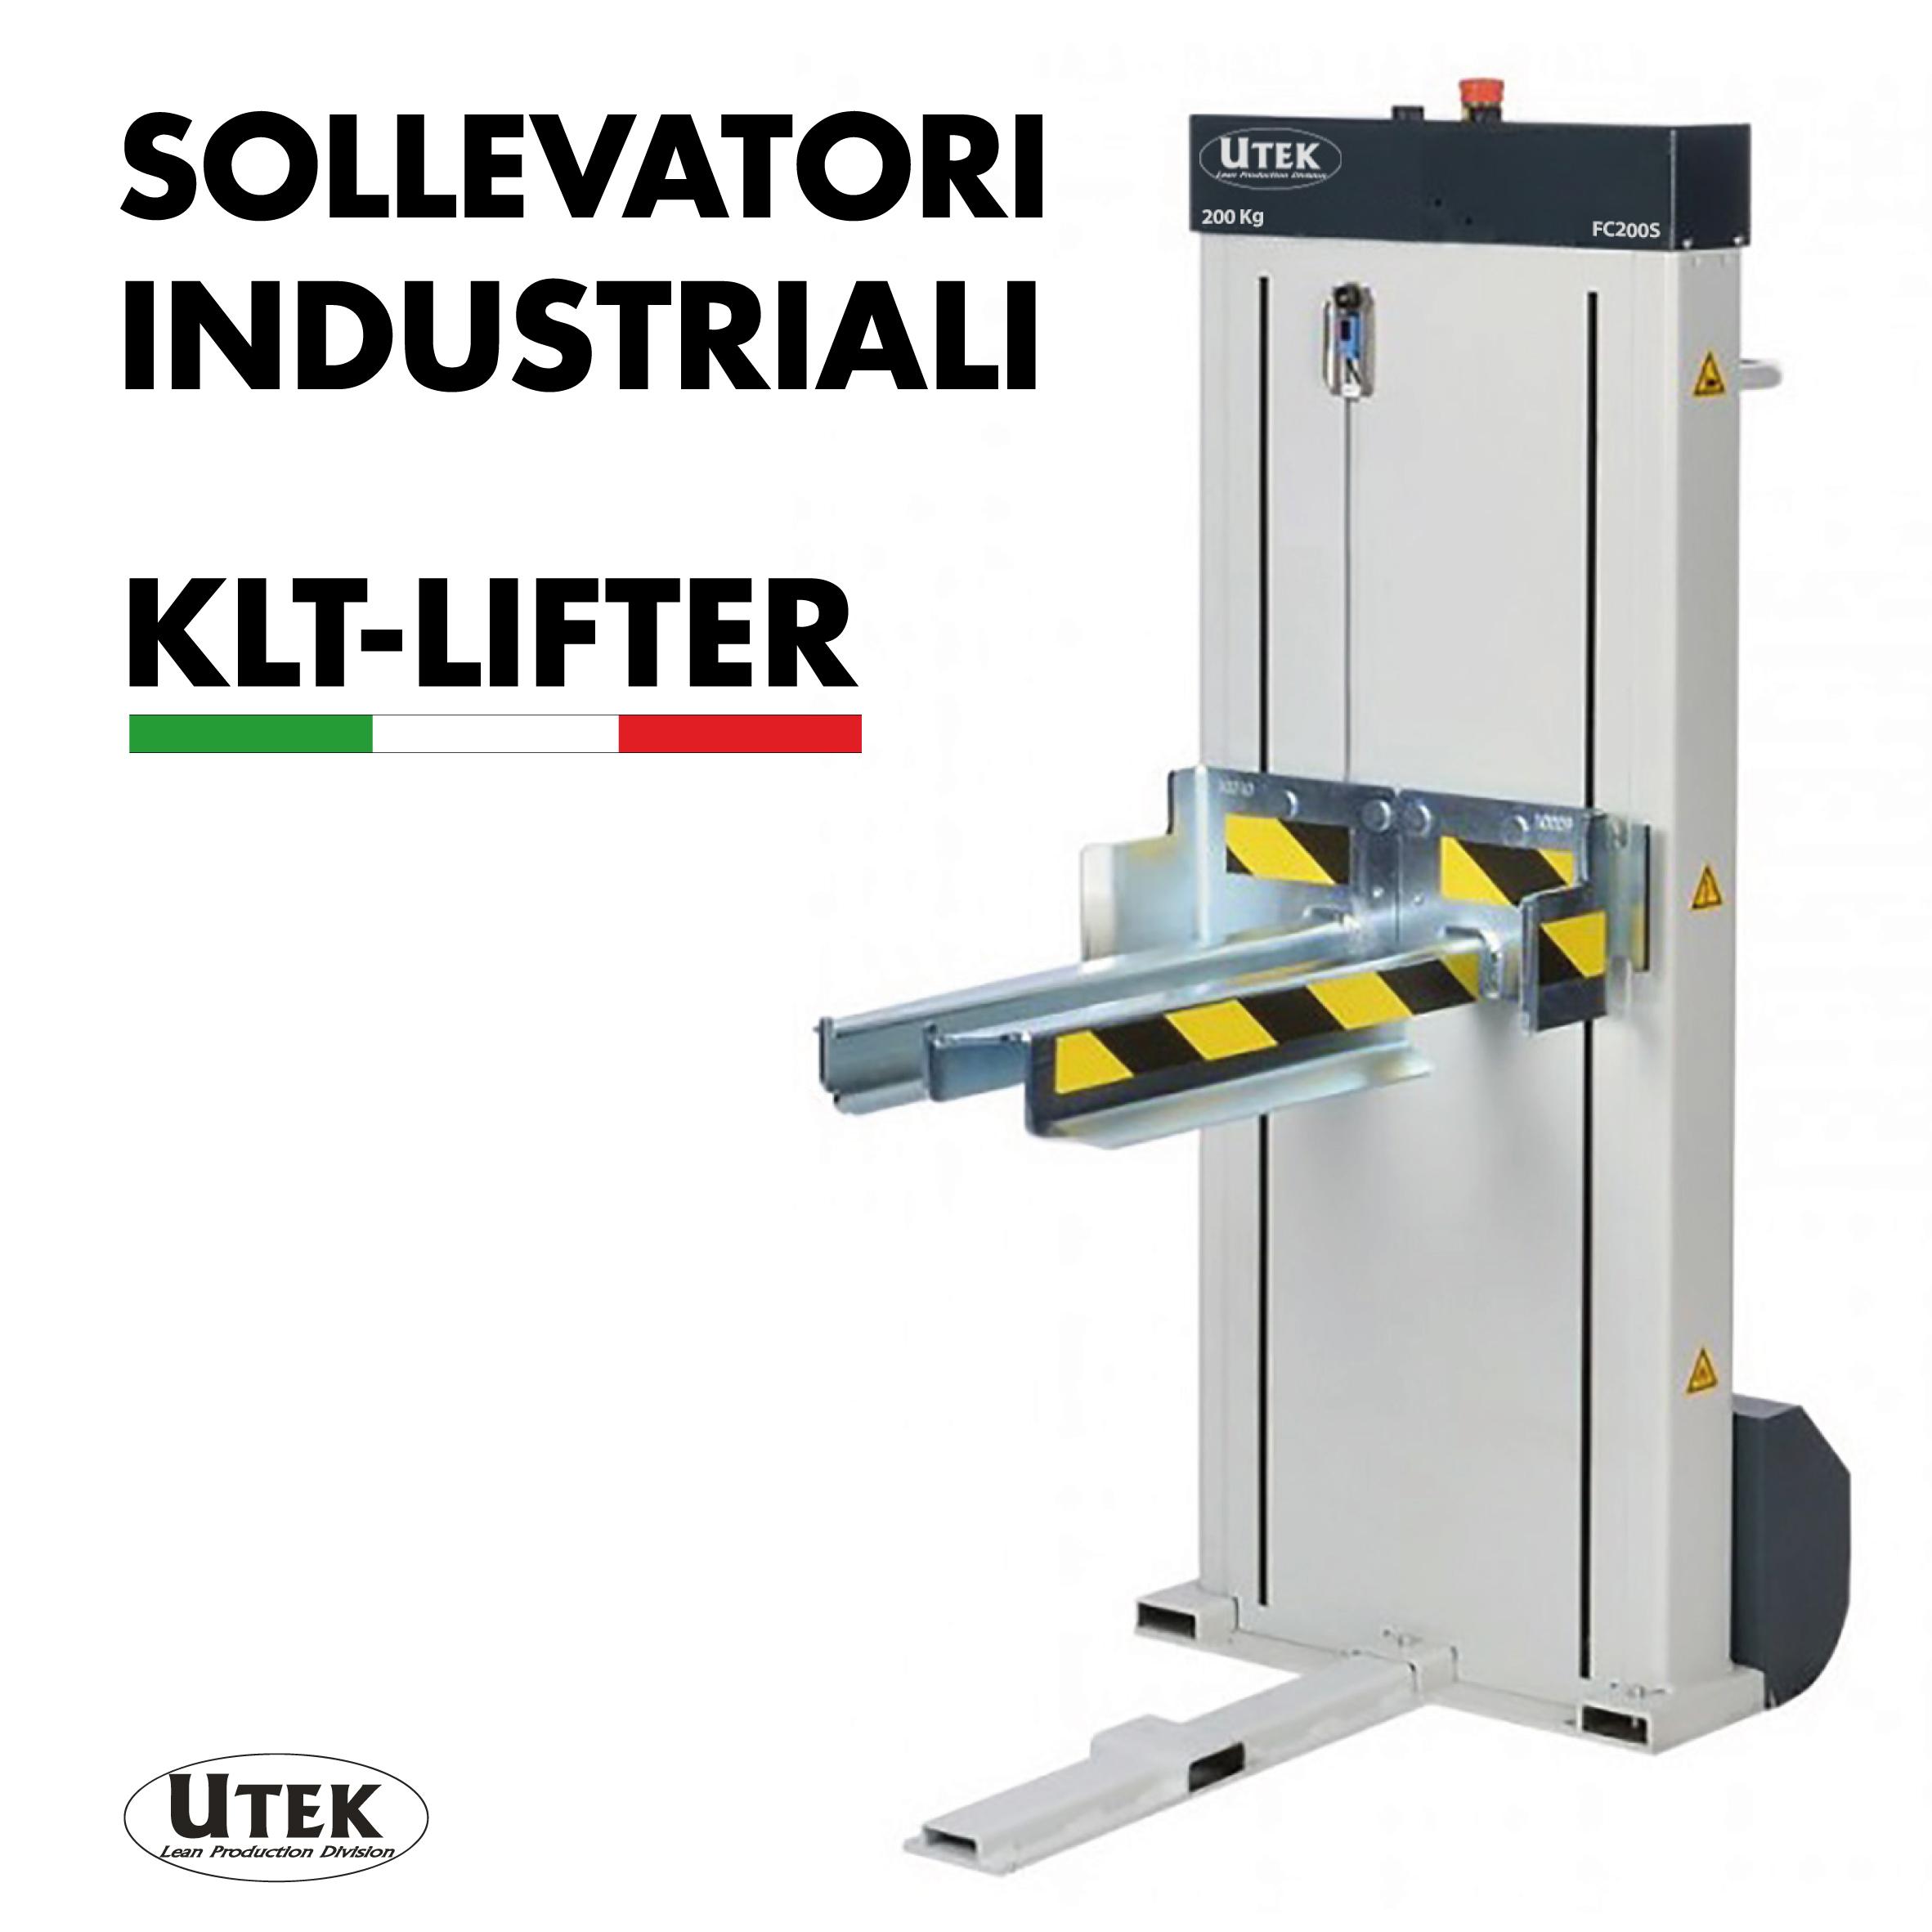 Sollevatori industriali Wuppermann KLB, Utek porta la produzione in Italia